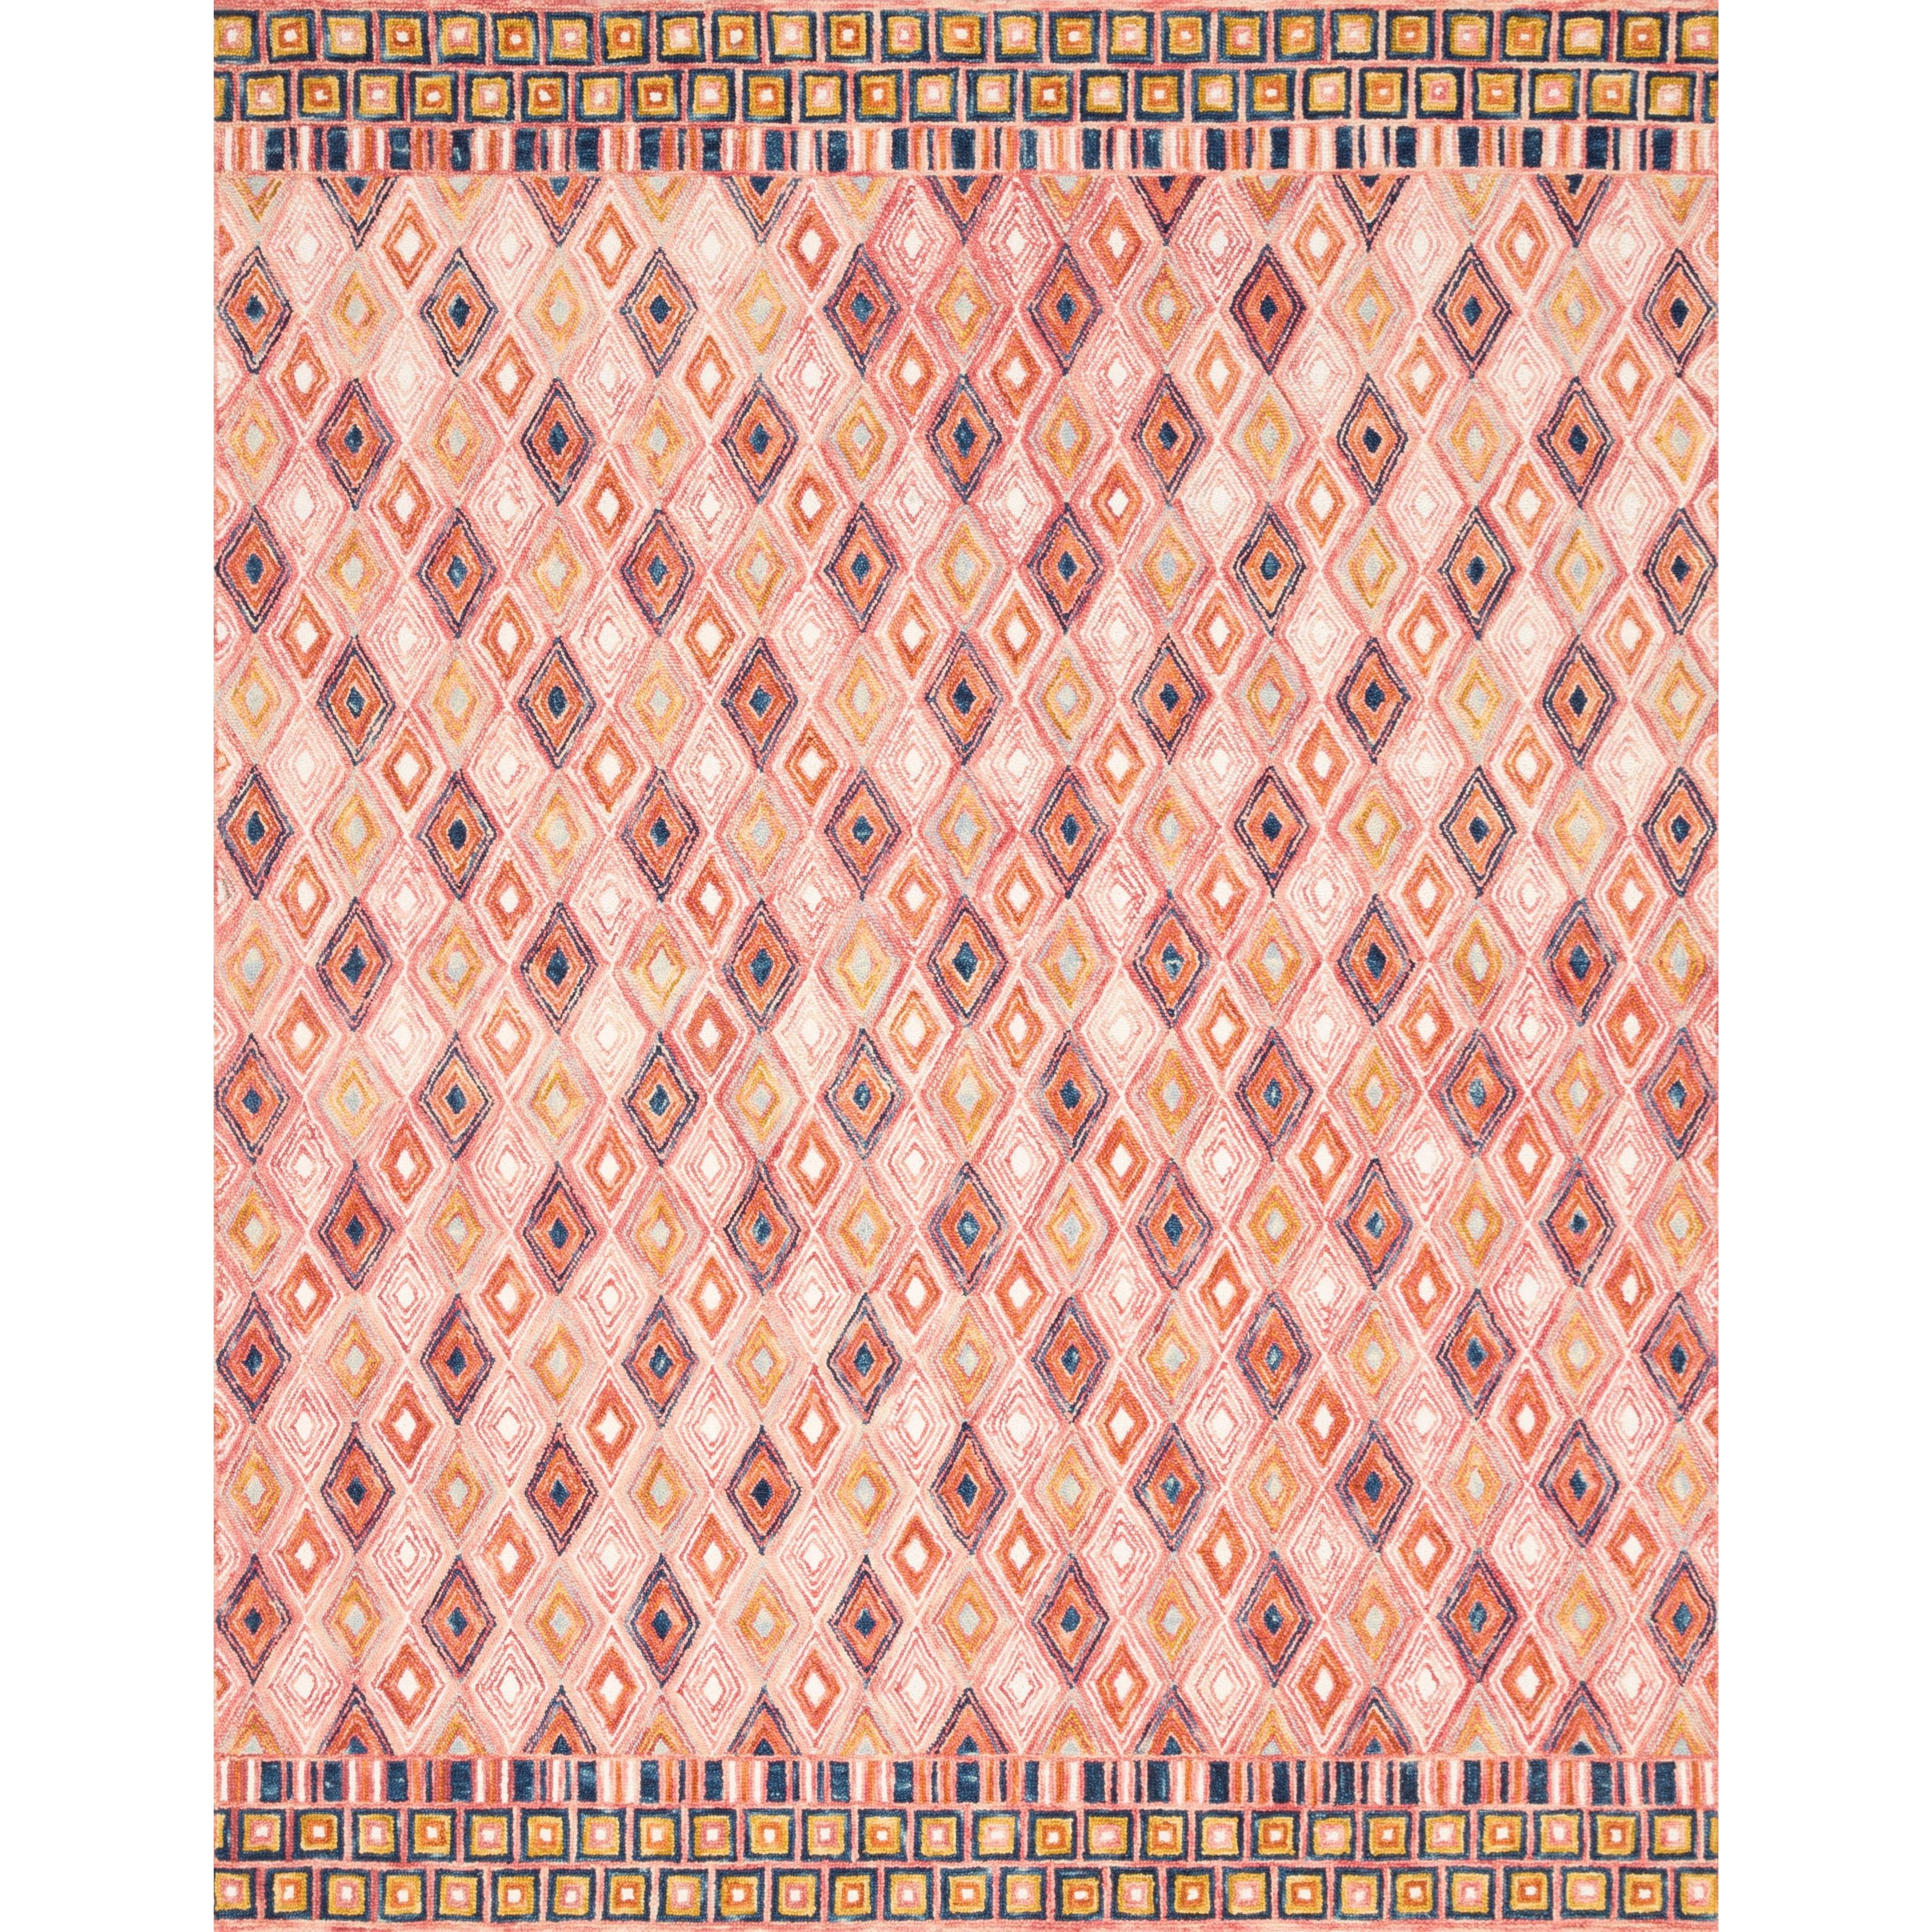 "Priti 7'9"" x 7'9"" Round Pink / Sunset Rug by Loloi Rugs at Virginia Furniture Market"